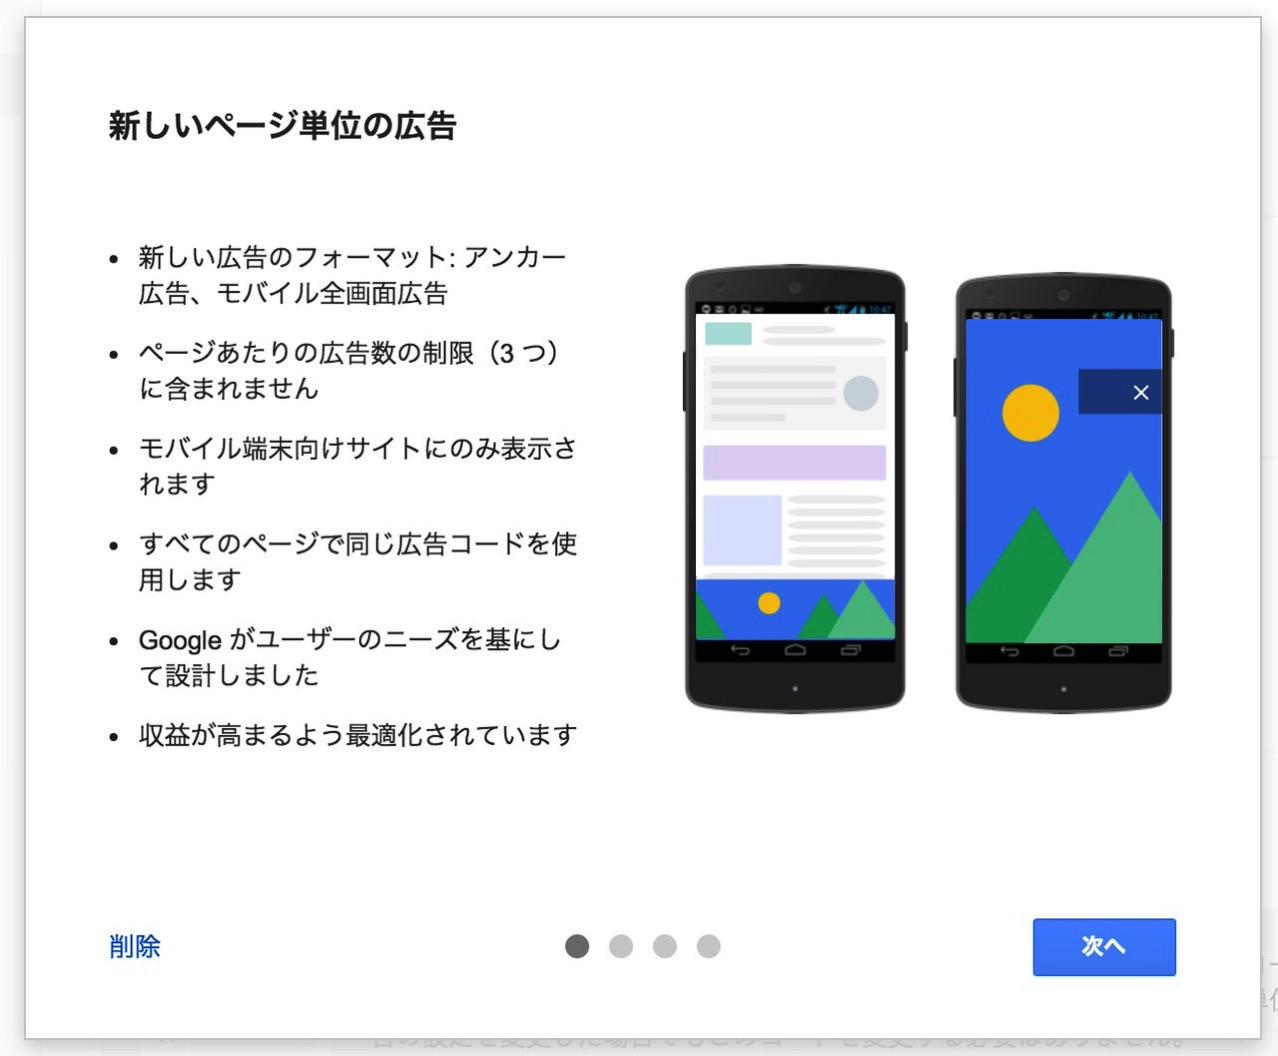 【Google AdSense】「ページ単位の広告」モバイル向けにページ下部の広告や全画面広告を開始